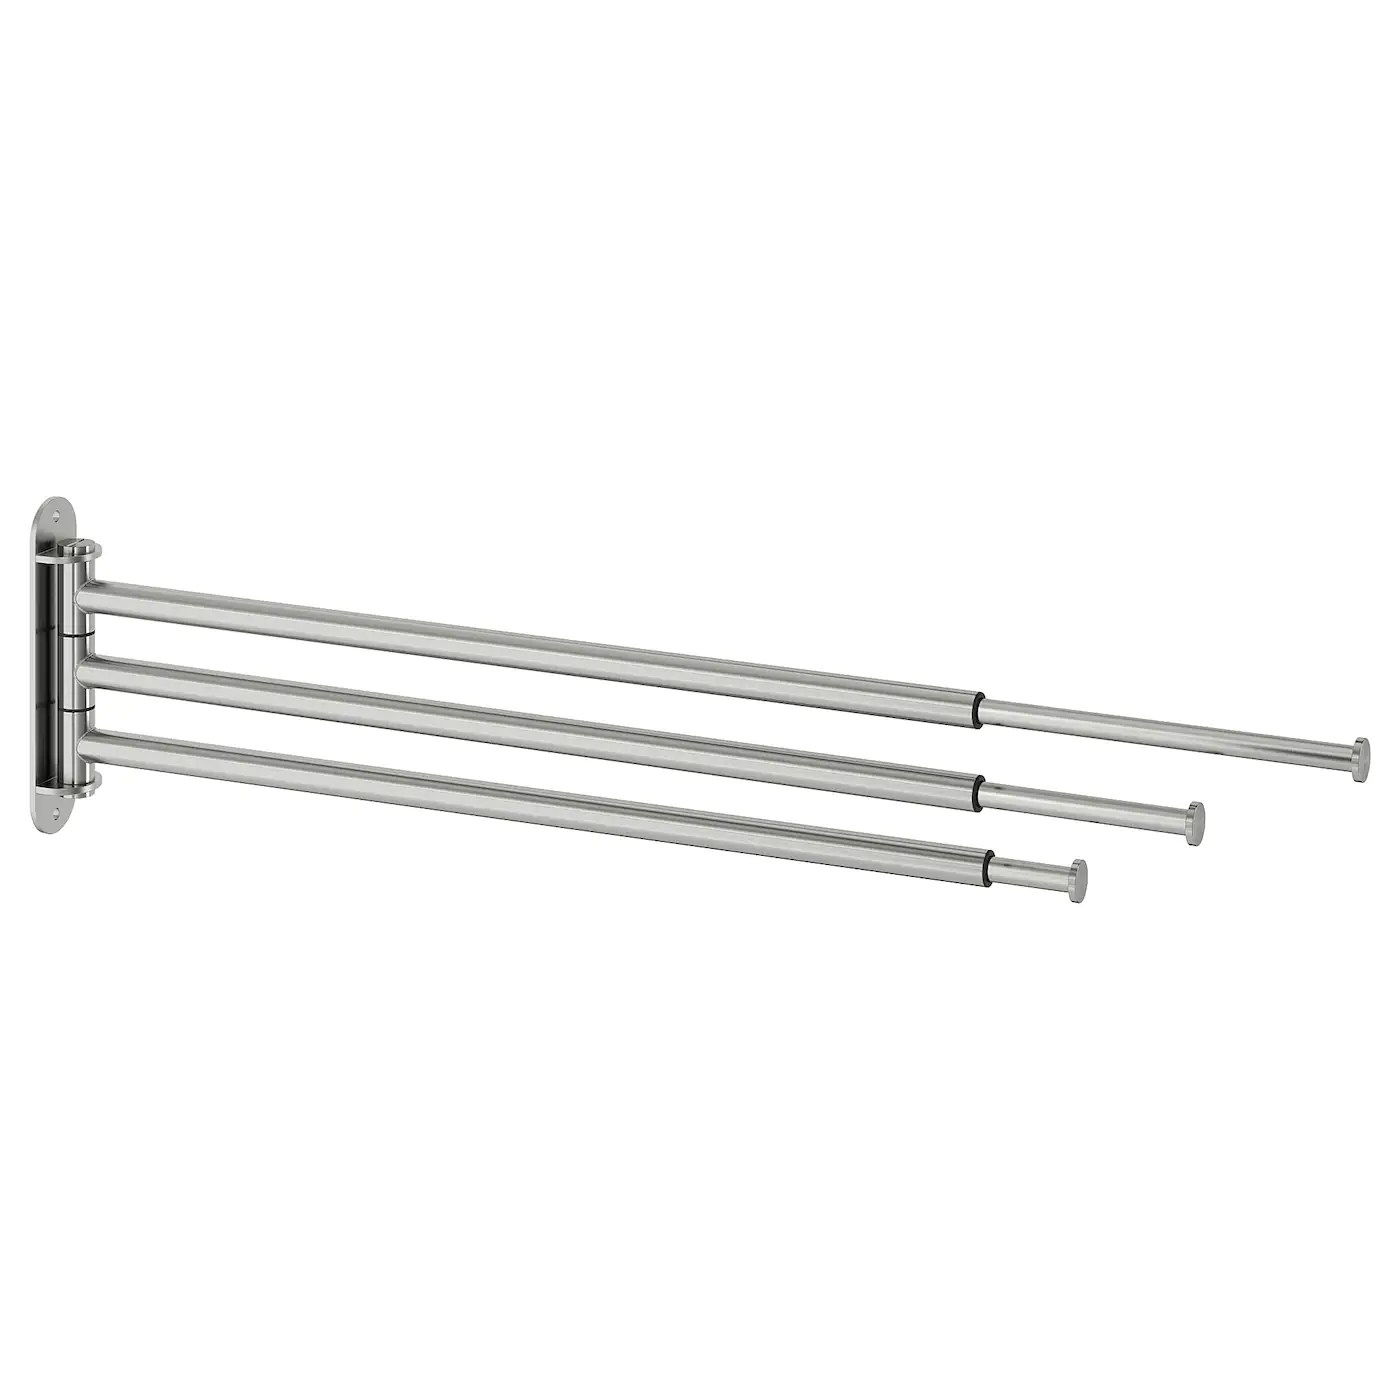 brogrund towel holder 3 bars stainless steel